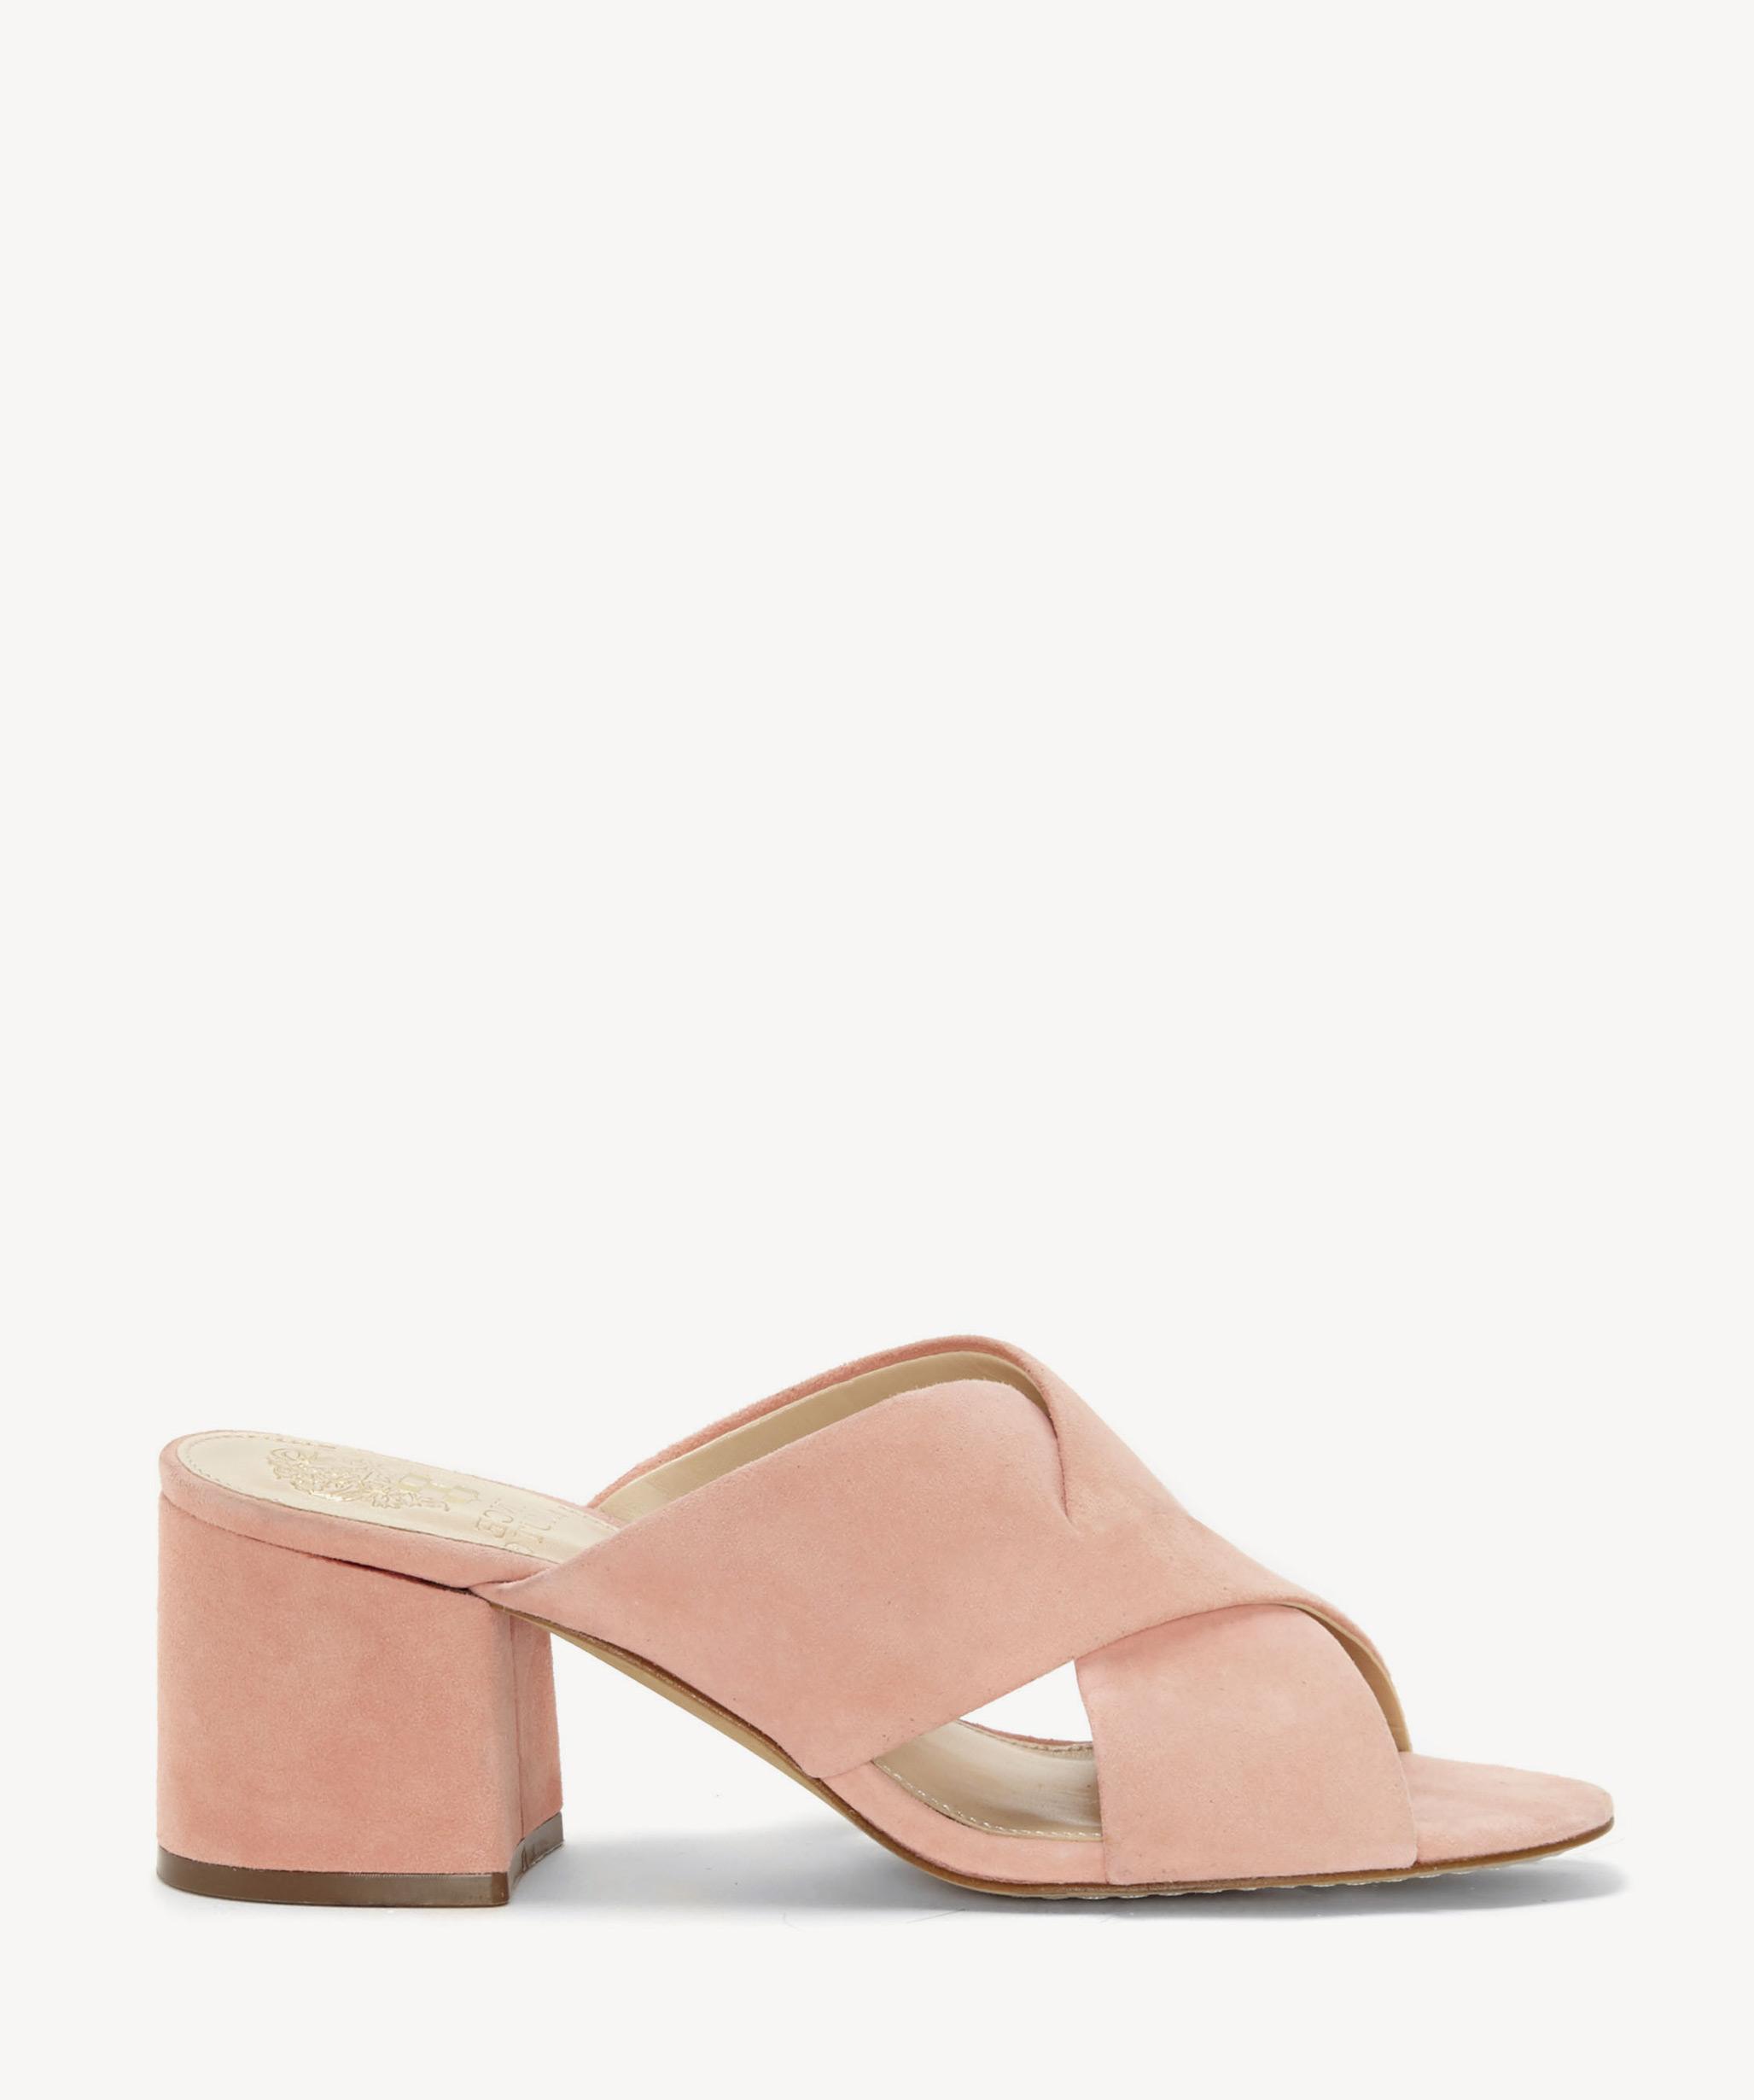 93d0091fe Vince Camuto Stania Criss Cross Sandals Fancy Flamingo